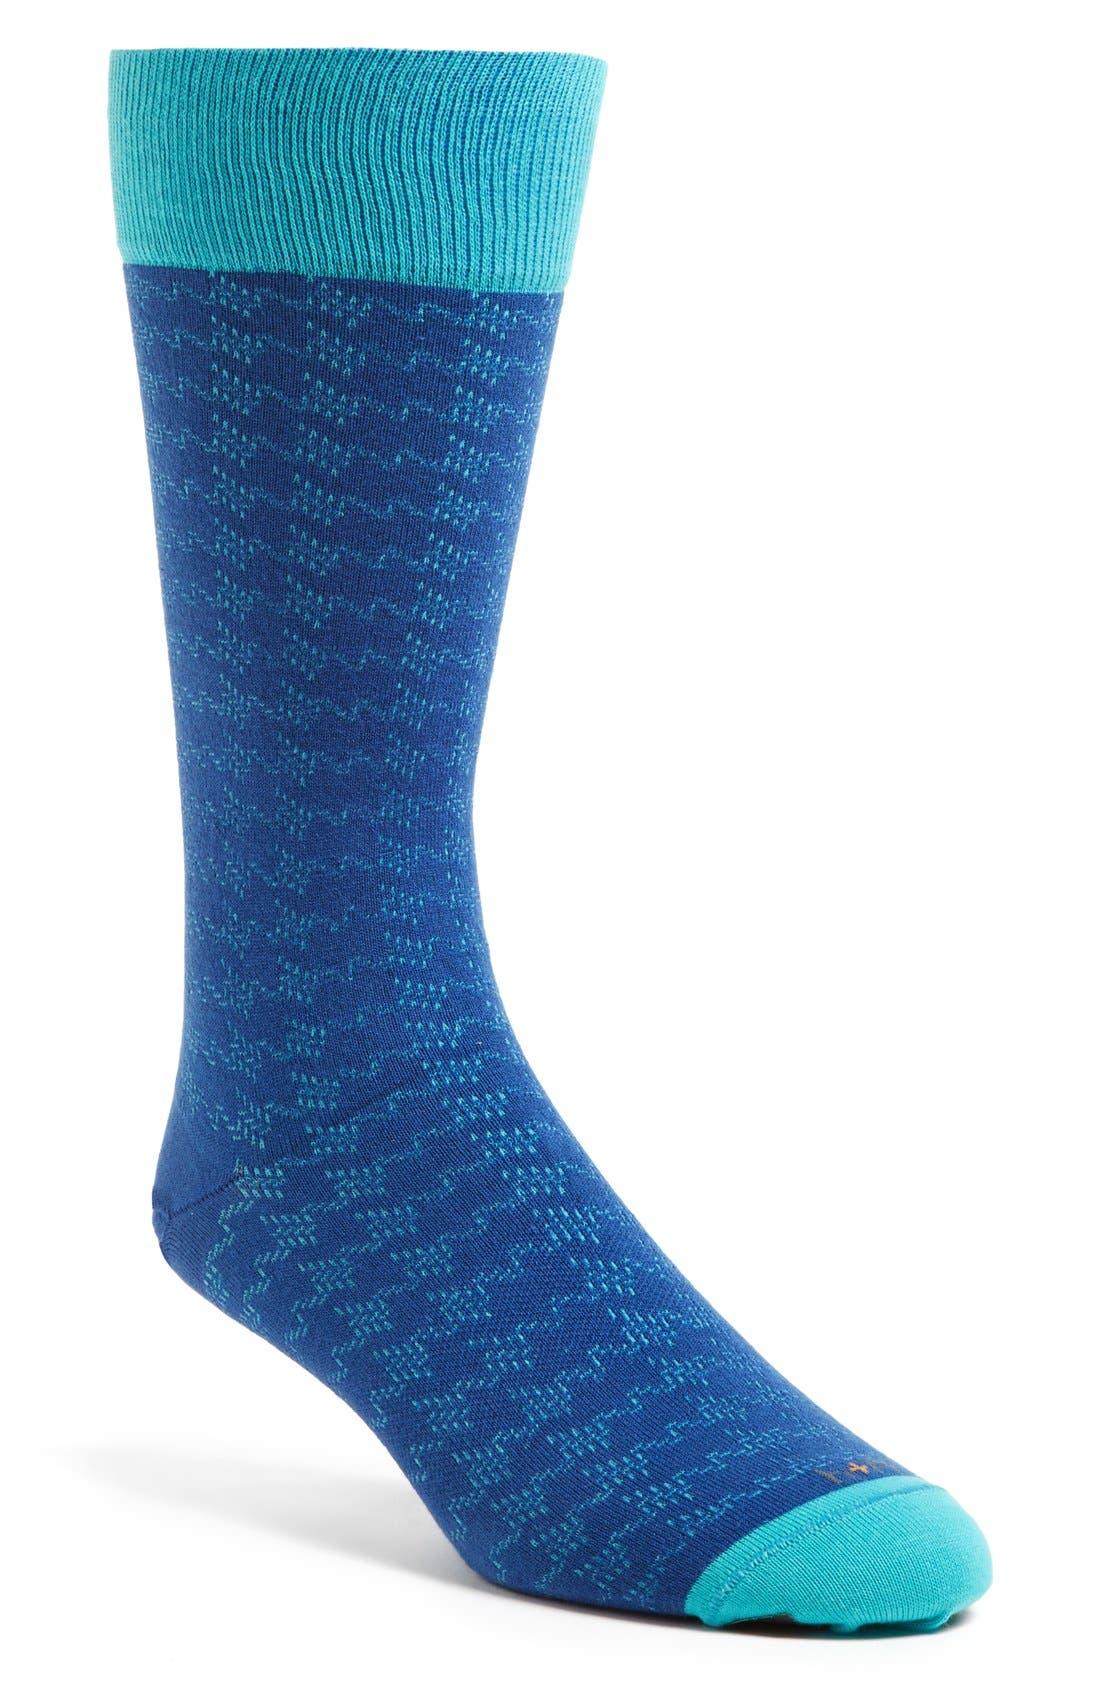 Main Image - hook + ALBERT 'Captoe' Socks